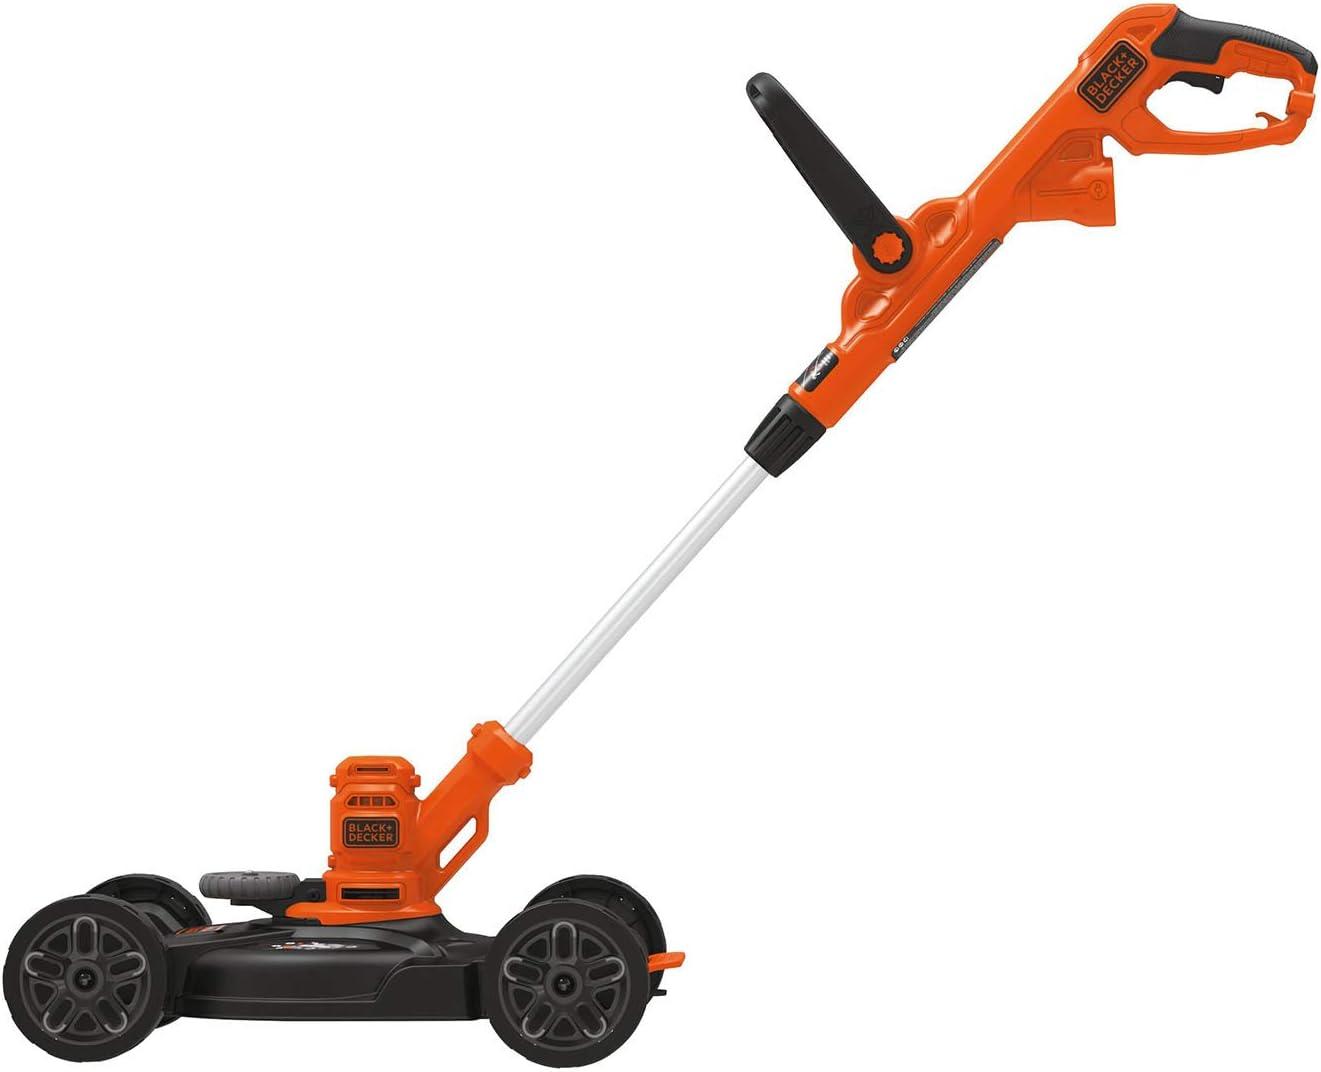 BLACK+DECKER BESTA512CM Electric Lawn Mower Amazon's Choice